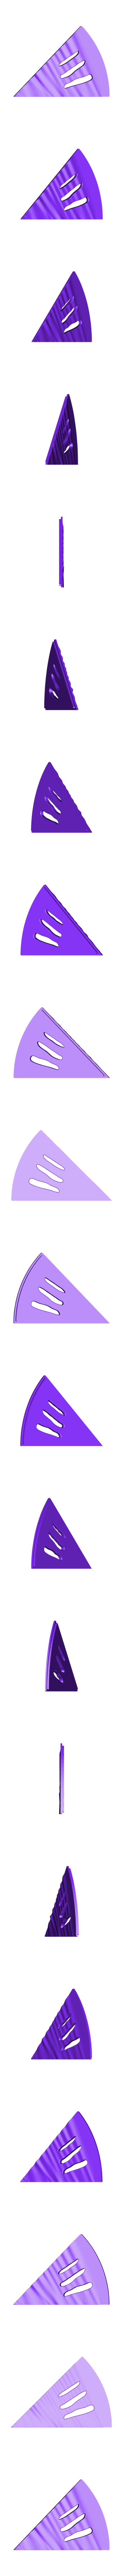 Pie_-_Pie_wCrust_Lid.stl Download free STL file Raspberry Pi Pie Case • 3D printer model, crprinting